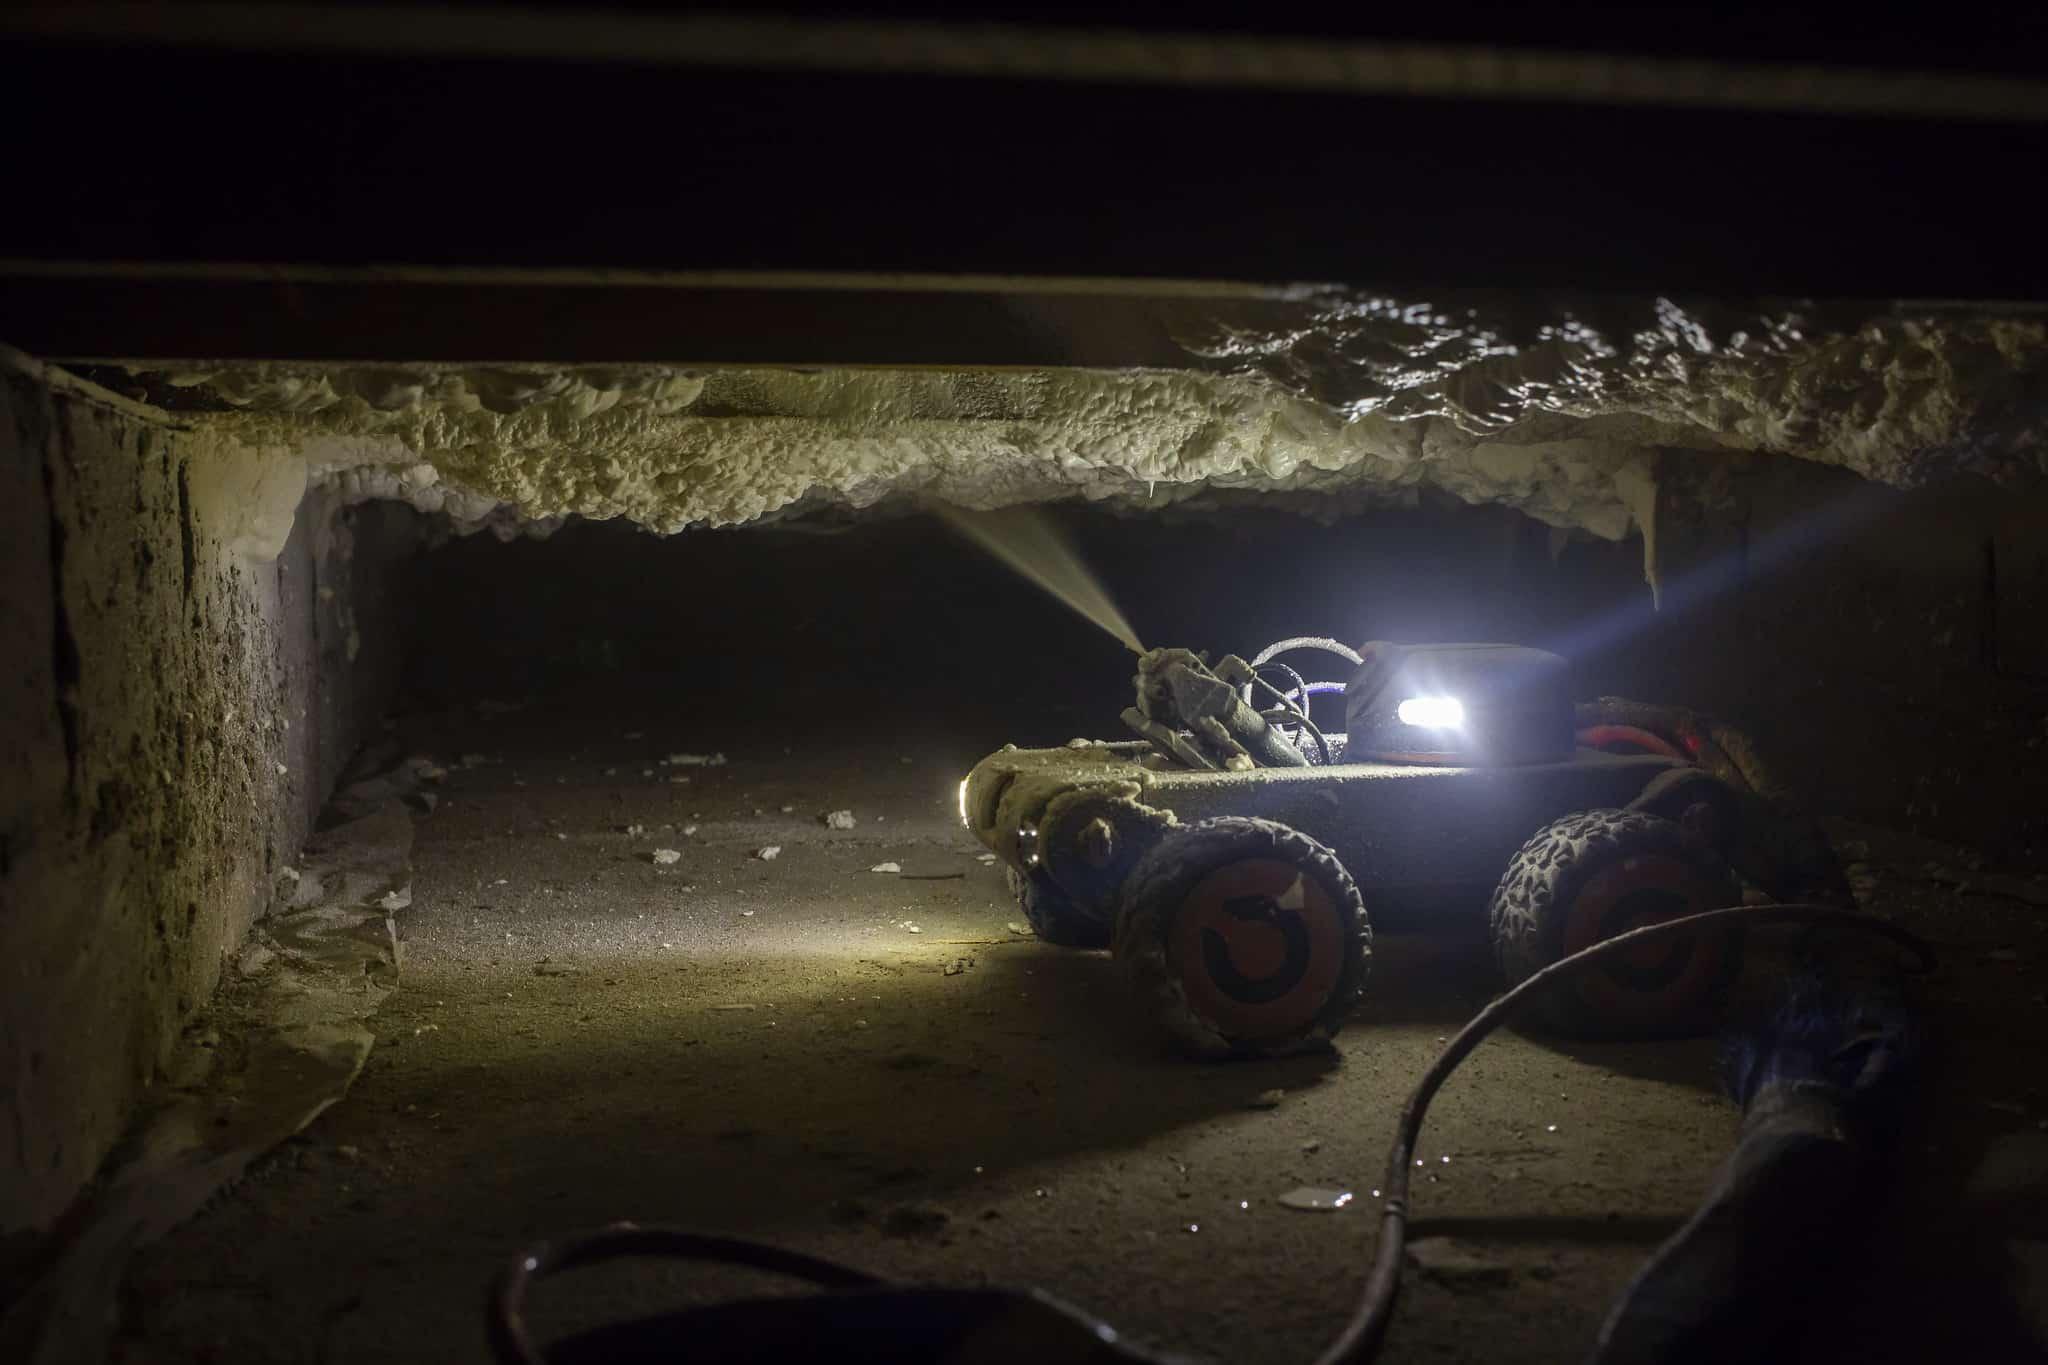 A wheeled robot spraying foam